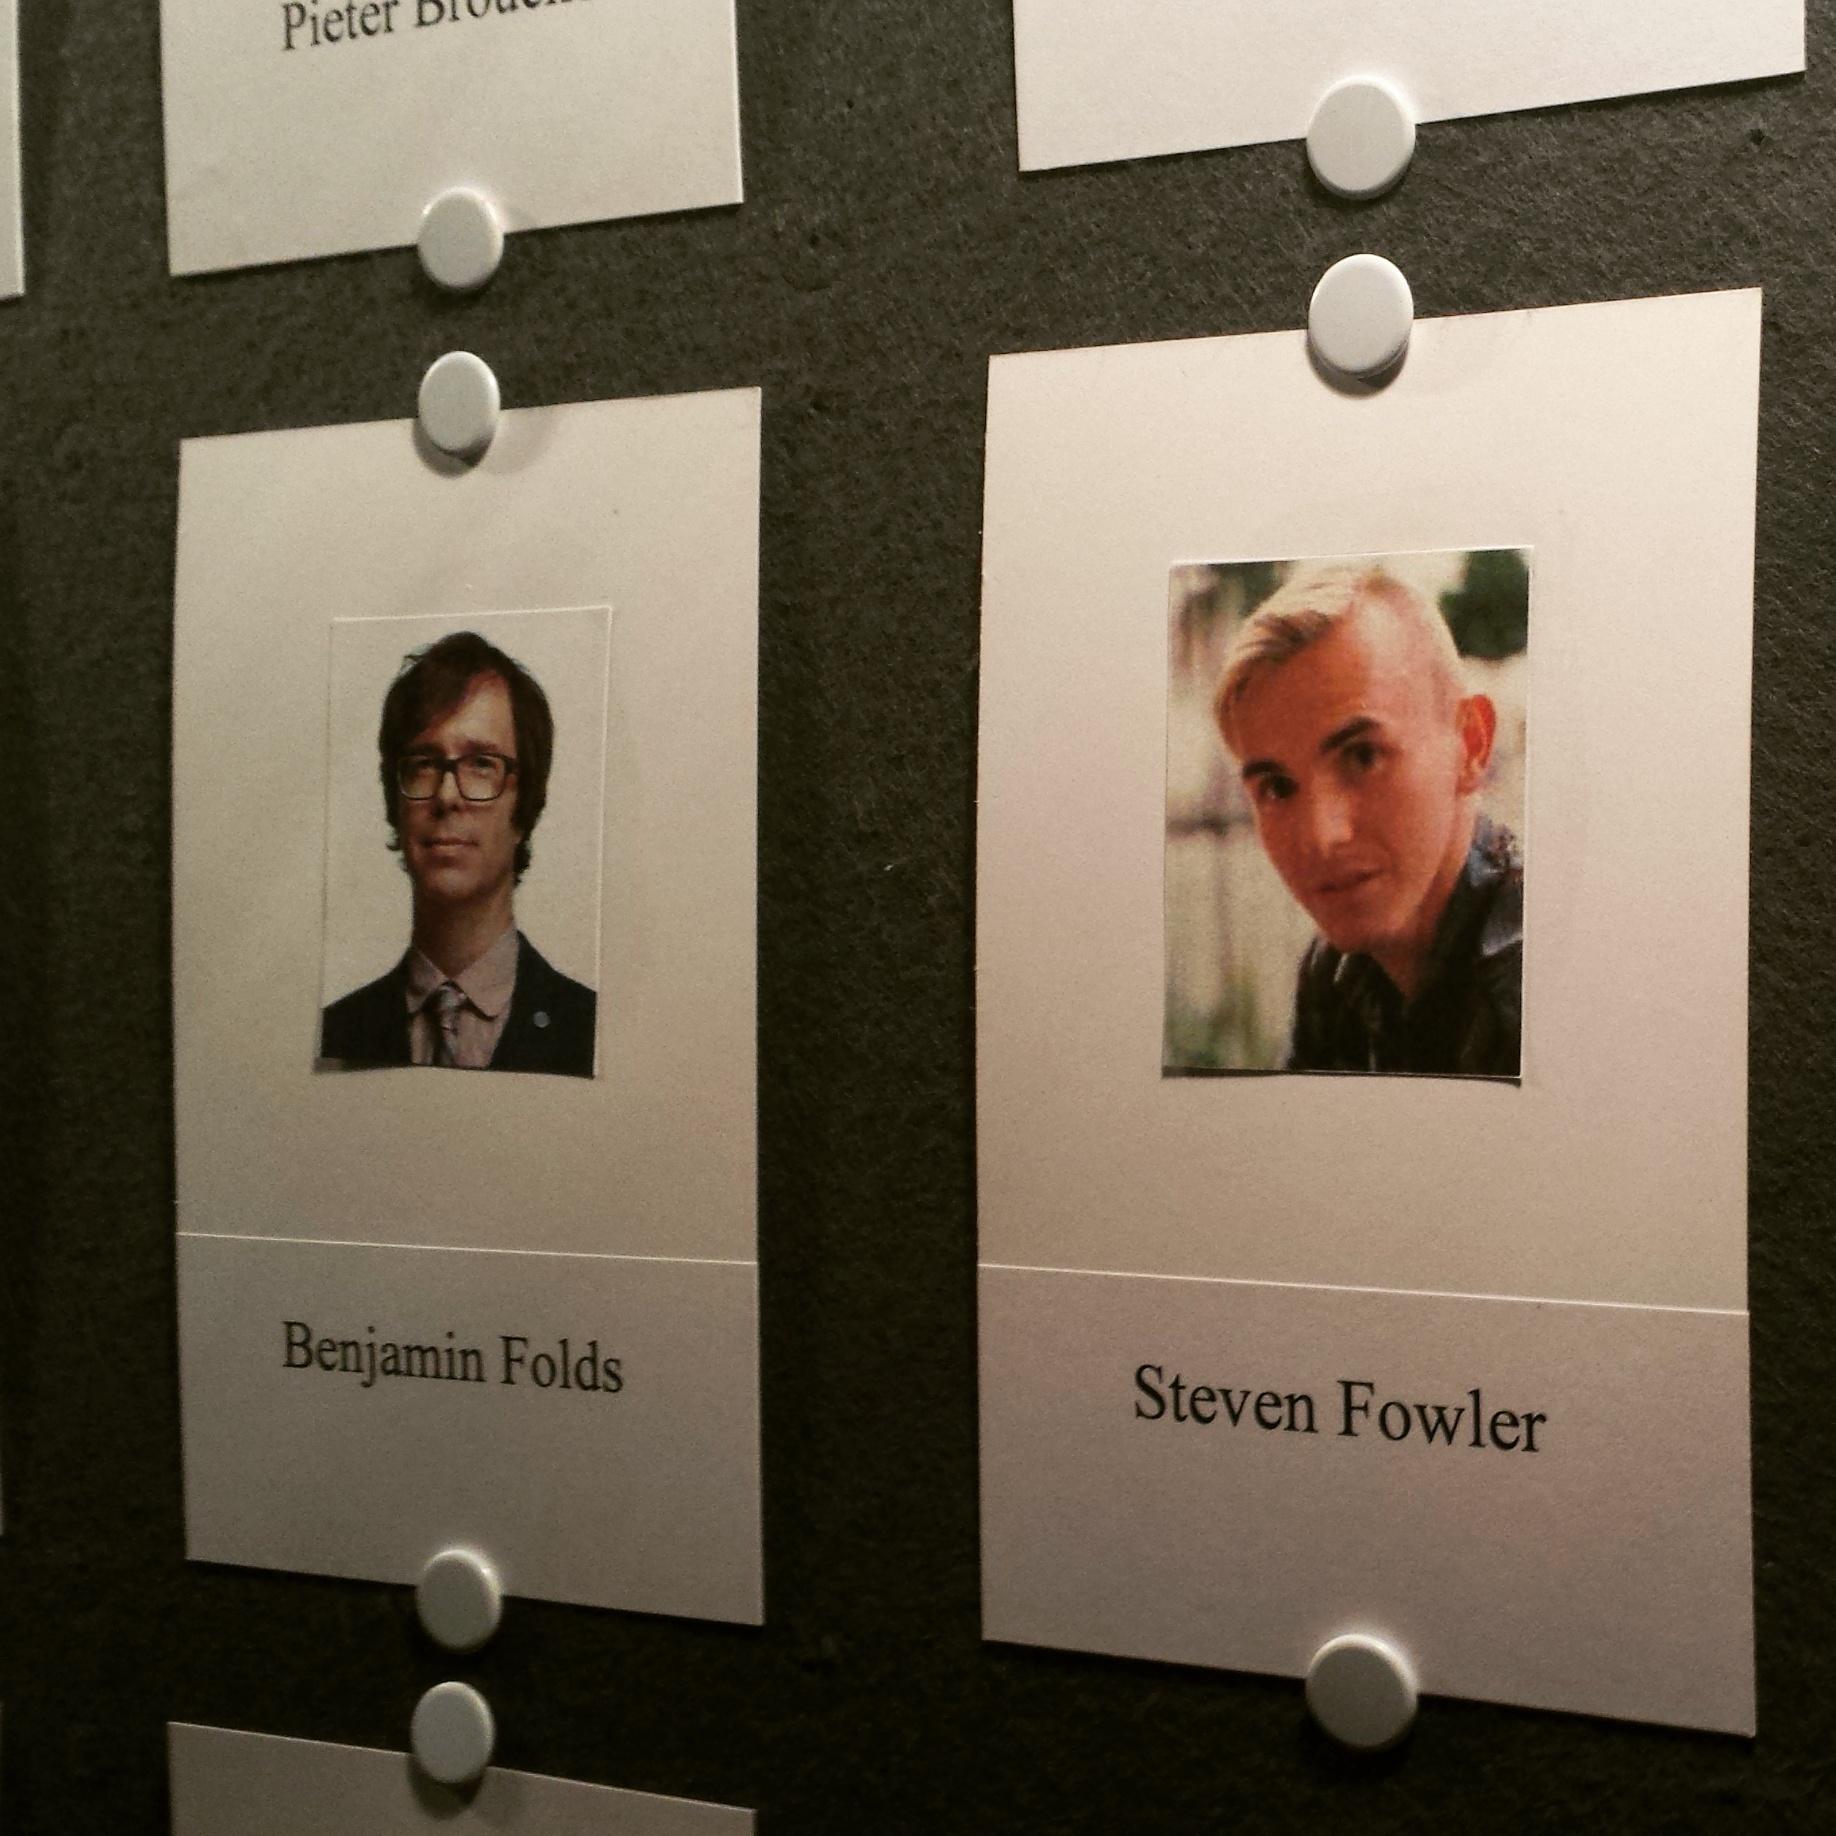 Salzburg Global Seminar: The Neuroscience of Art, Austria 2015